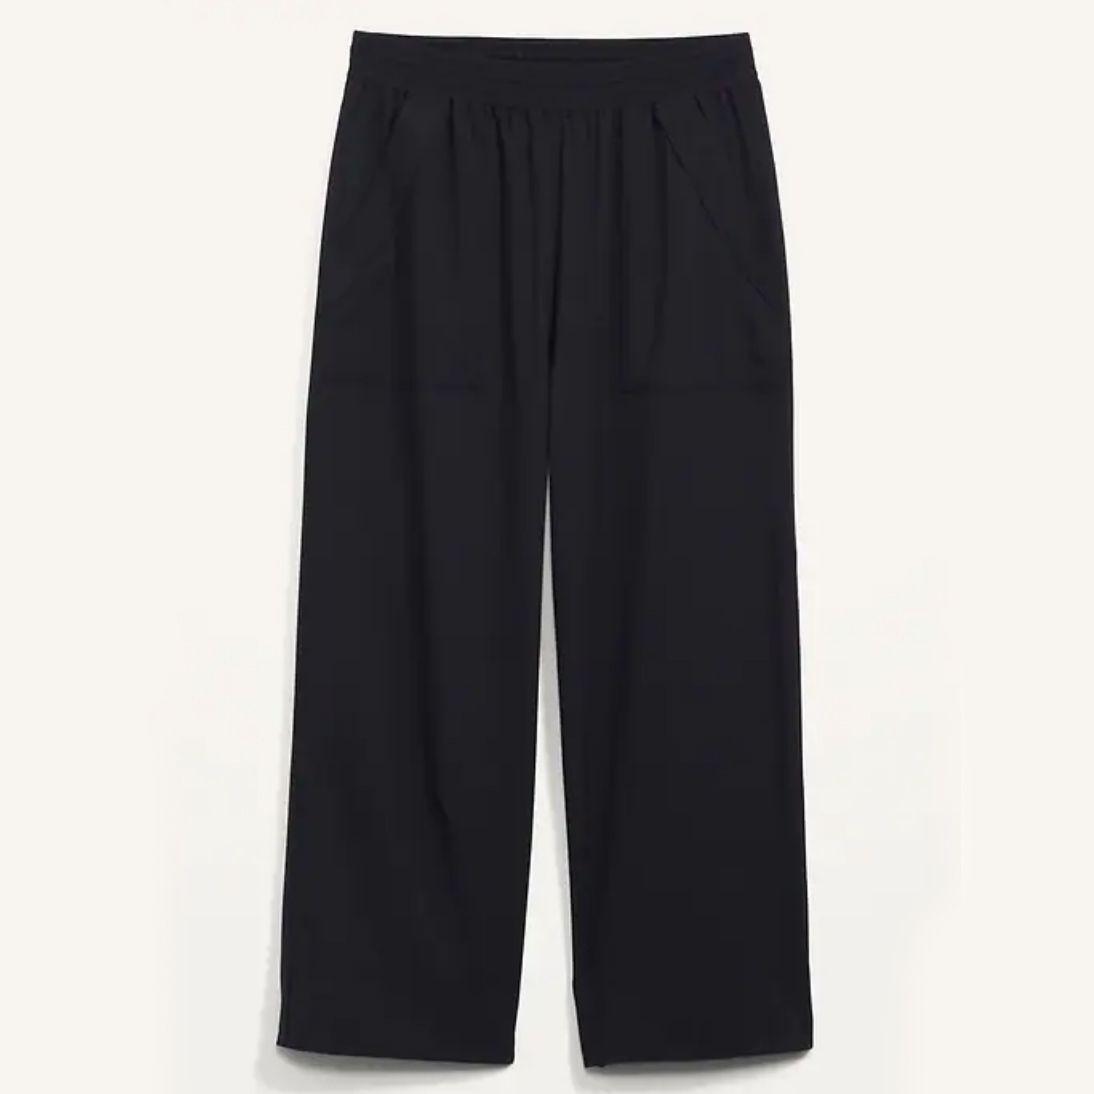 Old Navy High-Waisted StretchTech Wide-Leg Crop Pants